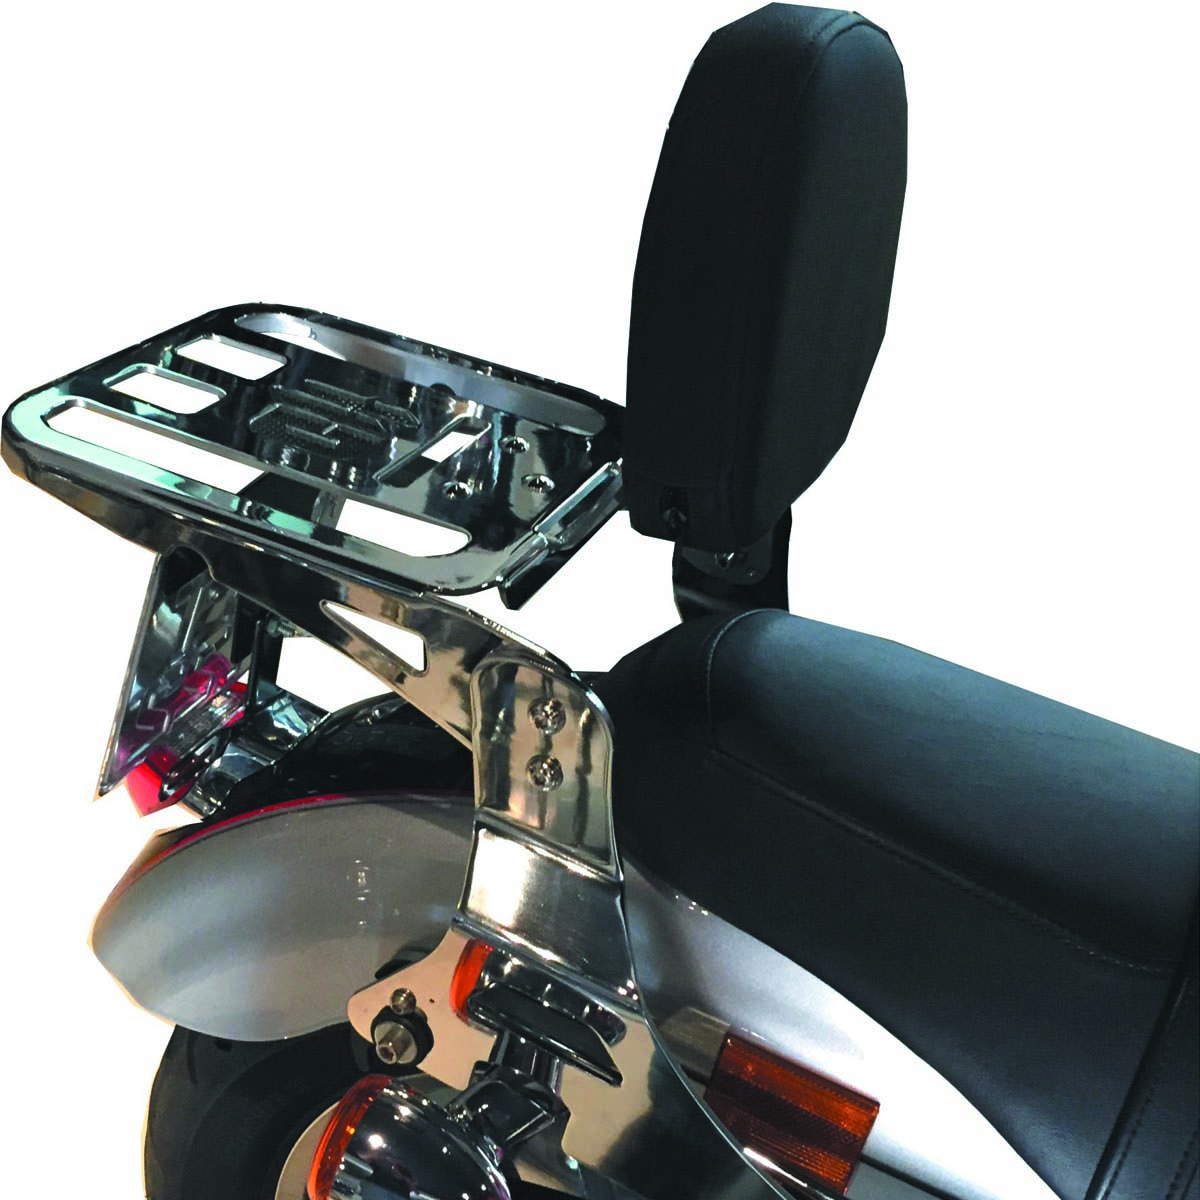 Sissy Bar / Encosto Destacável Modelo Low com Bagageiro - HD Softail Heritage / Deluxe até 2017 - Harley Davidson